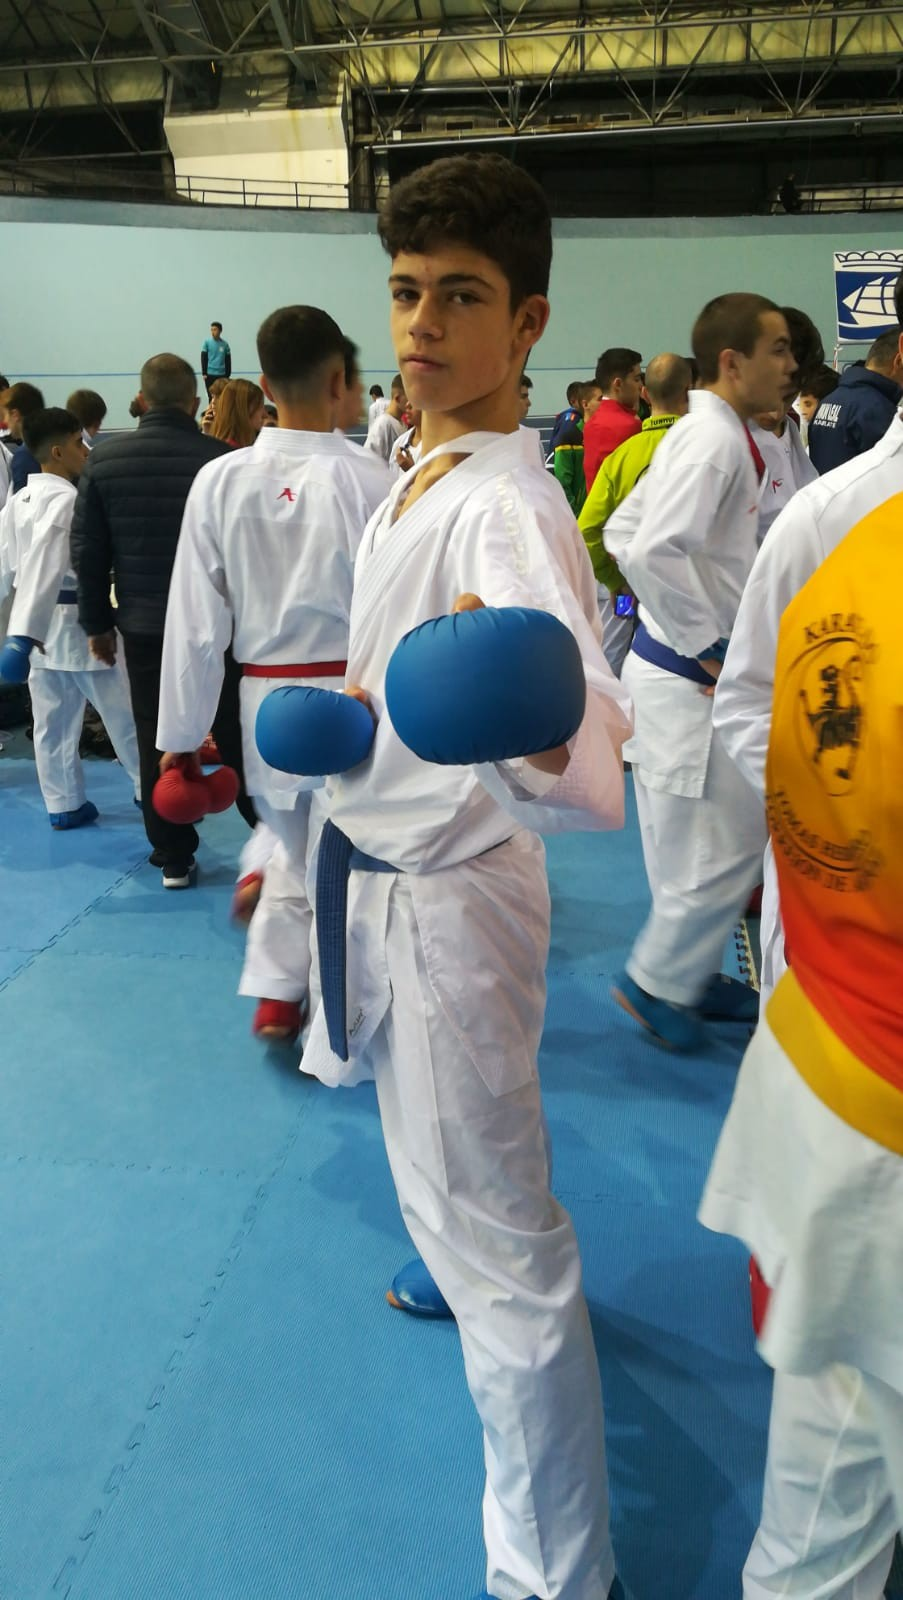 Shotoyama: Tres medallas en San Sebastián